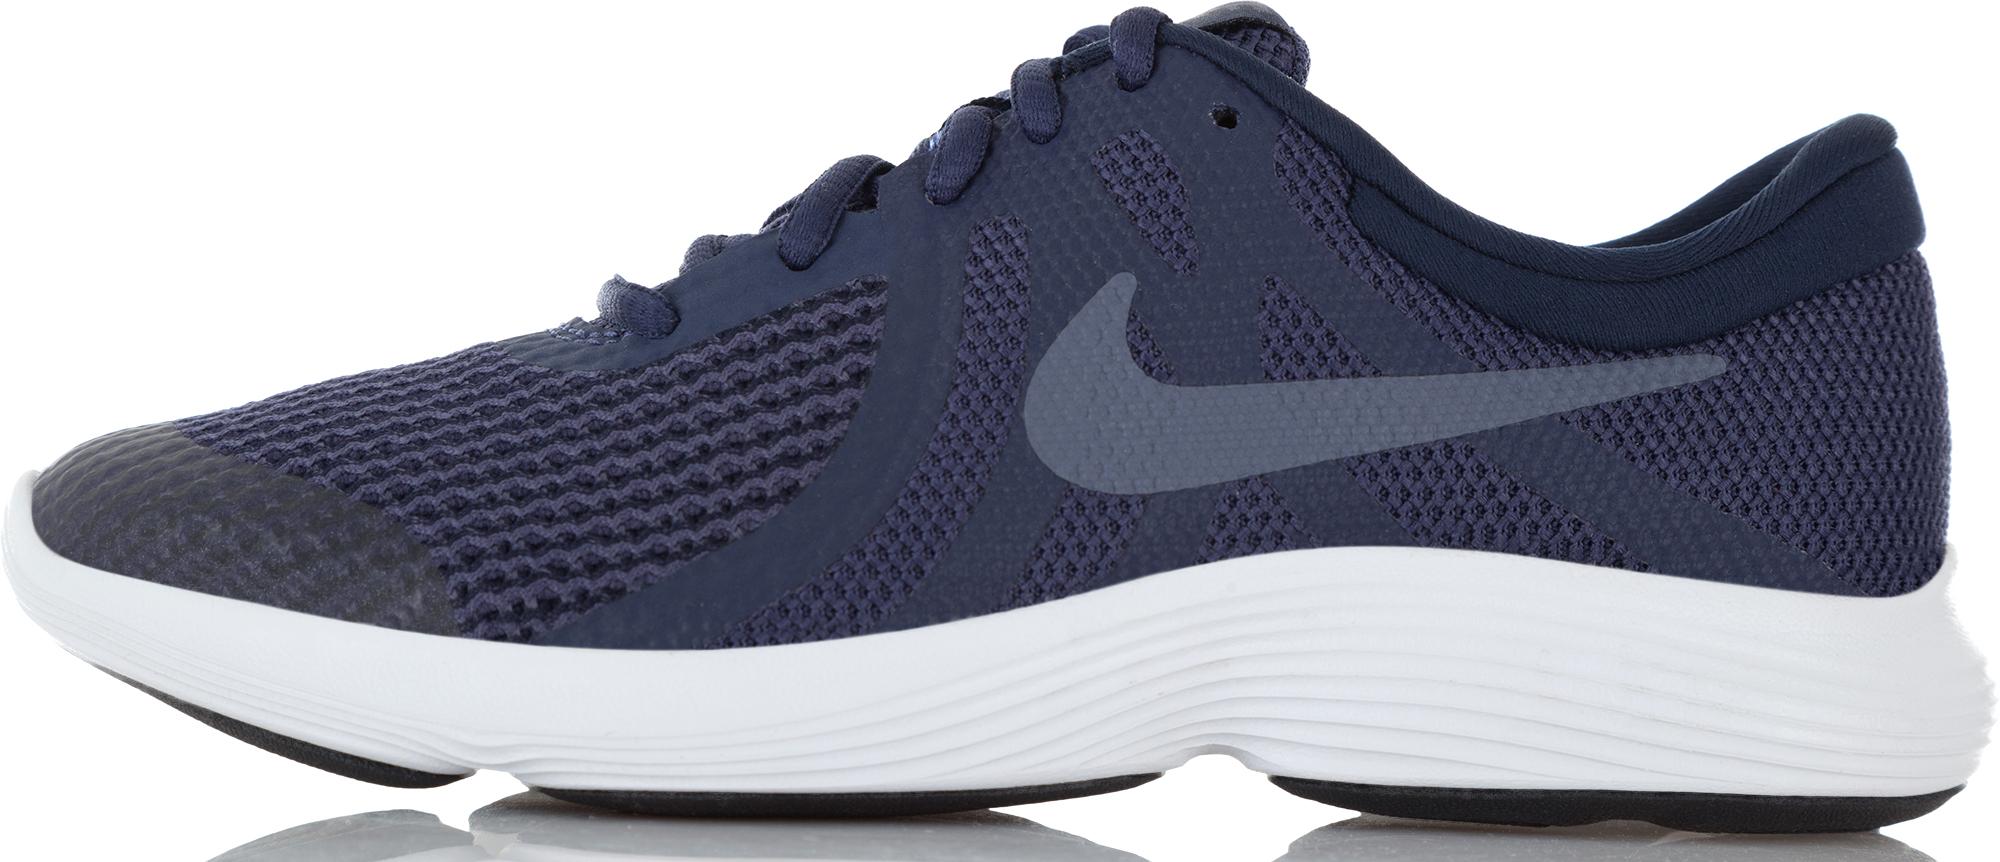 Nike Кроссовки детские Nike Revolution 4, размер 35,5